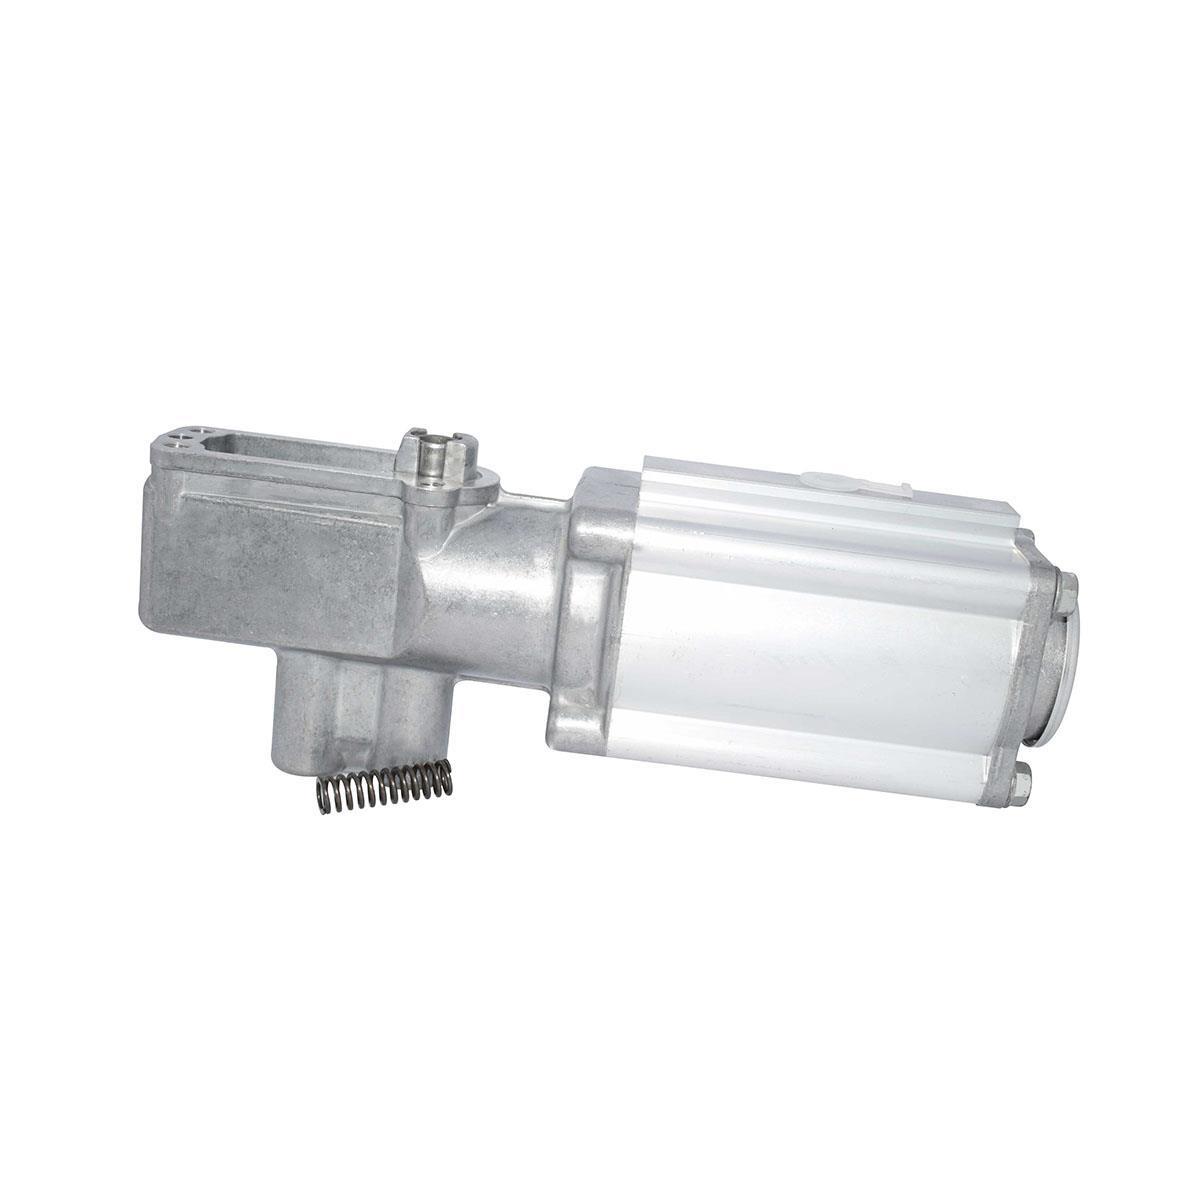 Servoshift caixa de câmbio ZF 9S1110TD/9S1310TD/9S1315TD/16S2520TO/6S1010BO/6S1000TO